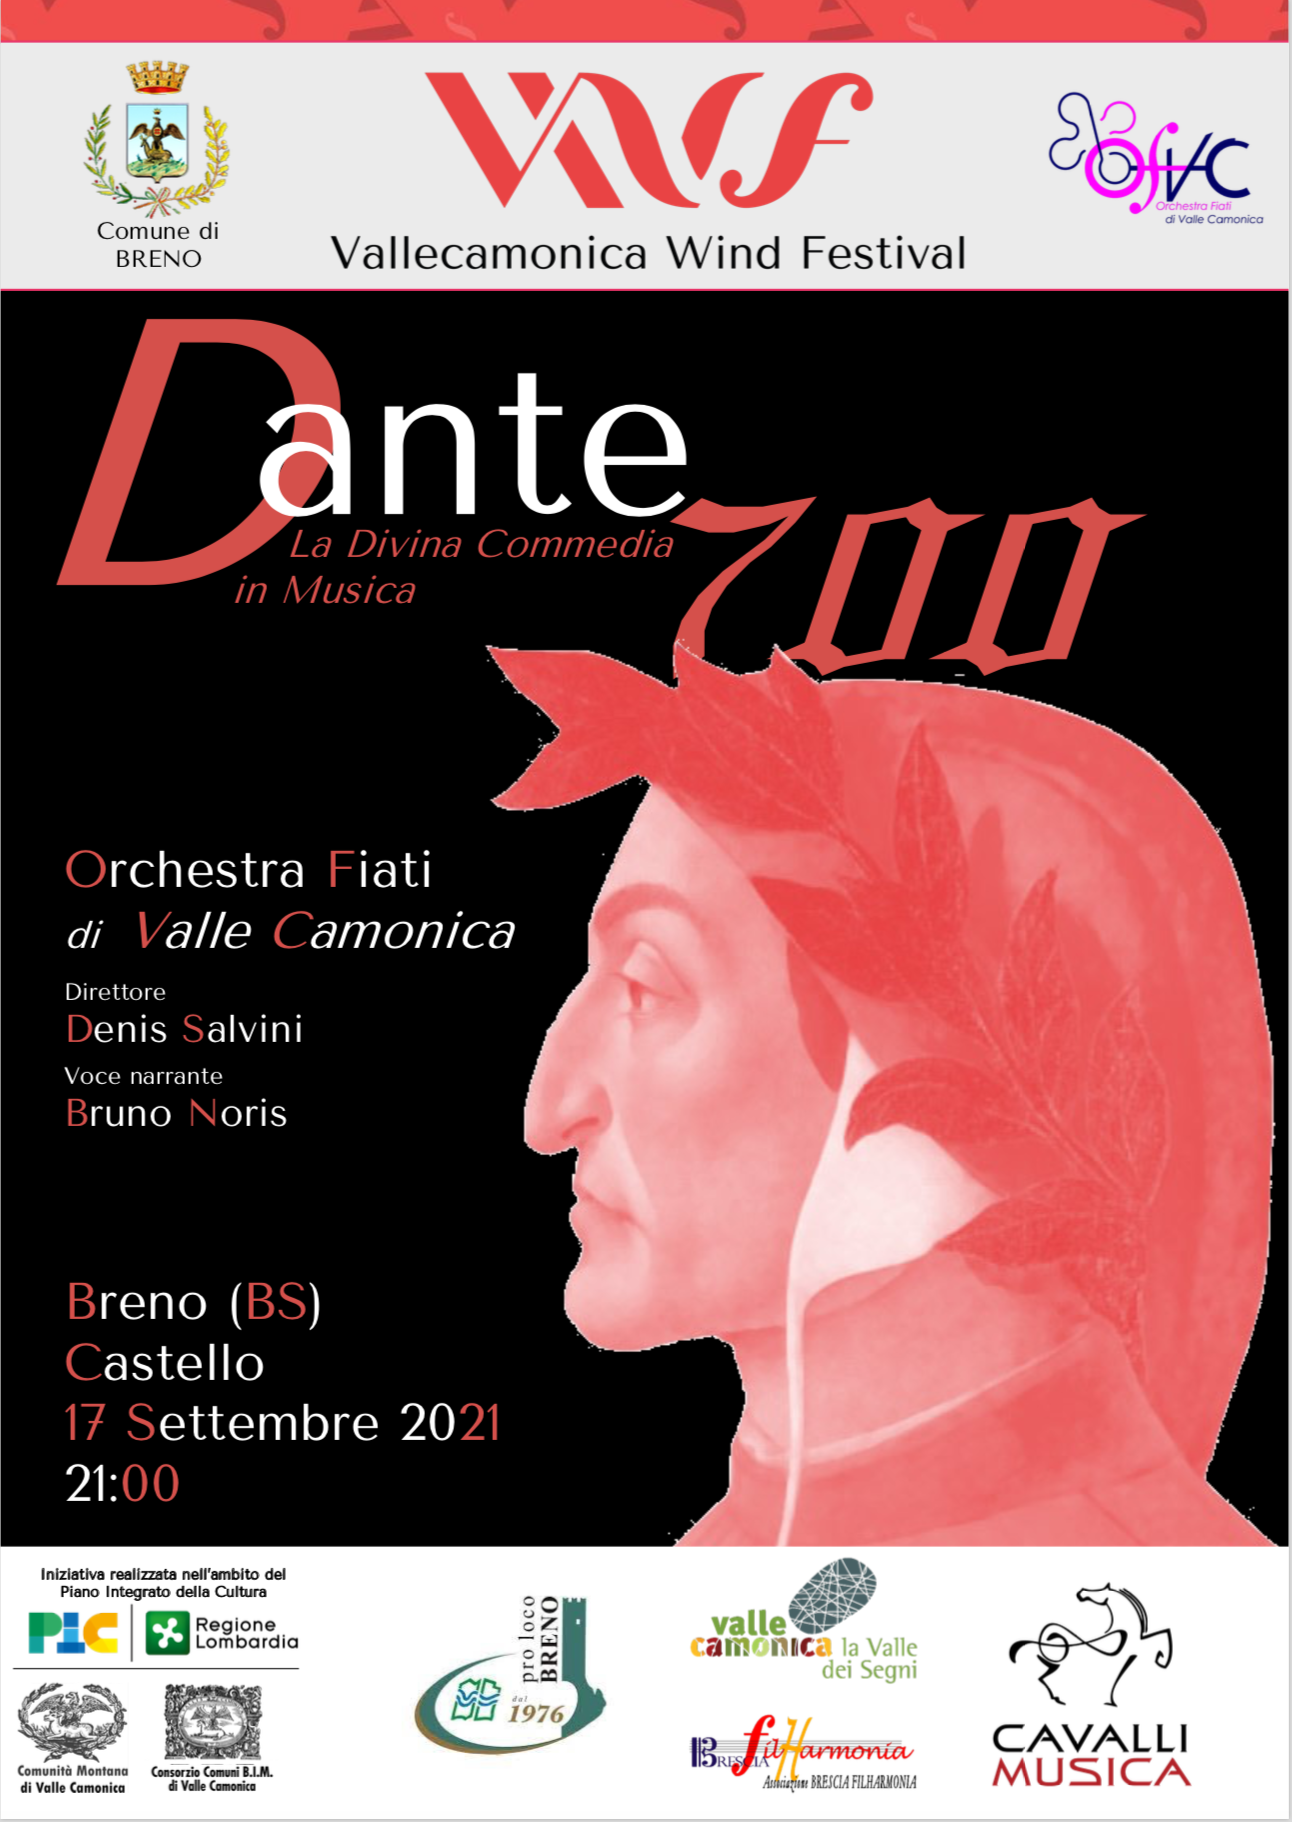 Dante 700 - Vallecamonica WindF